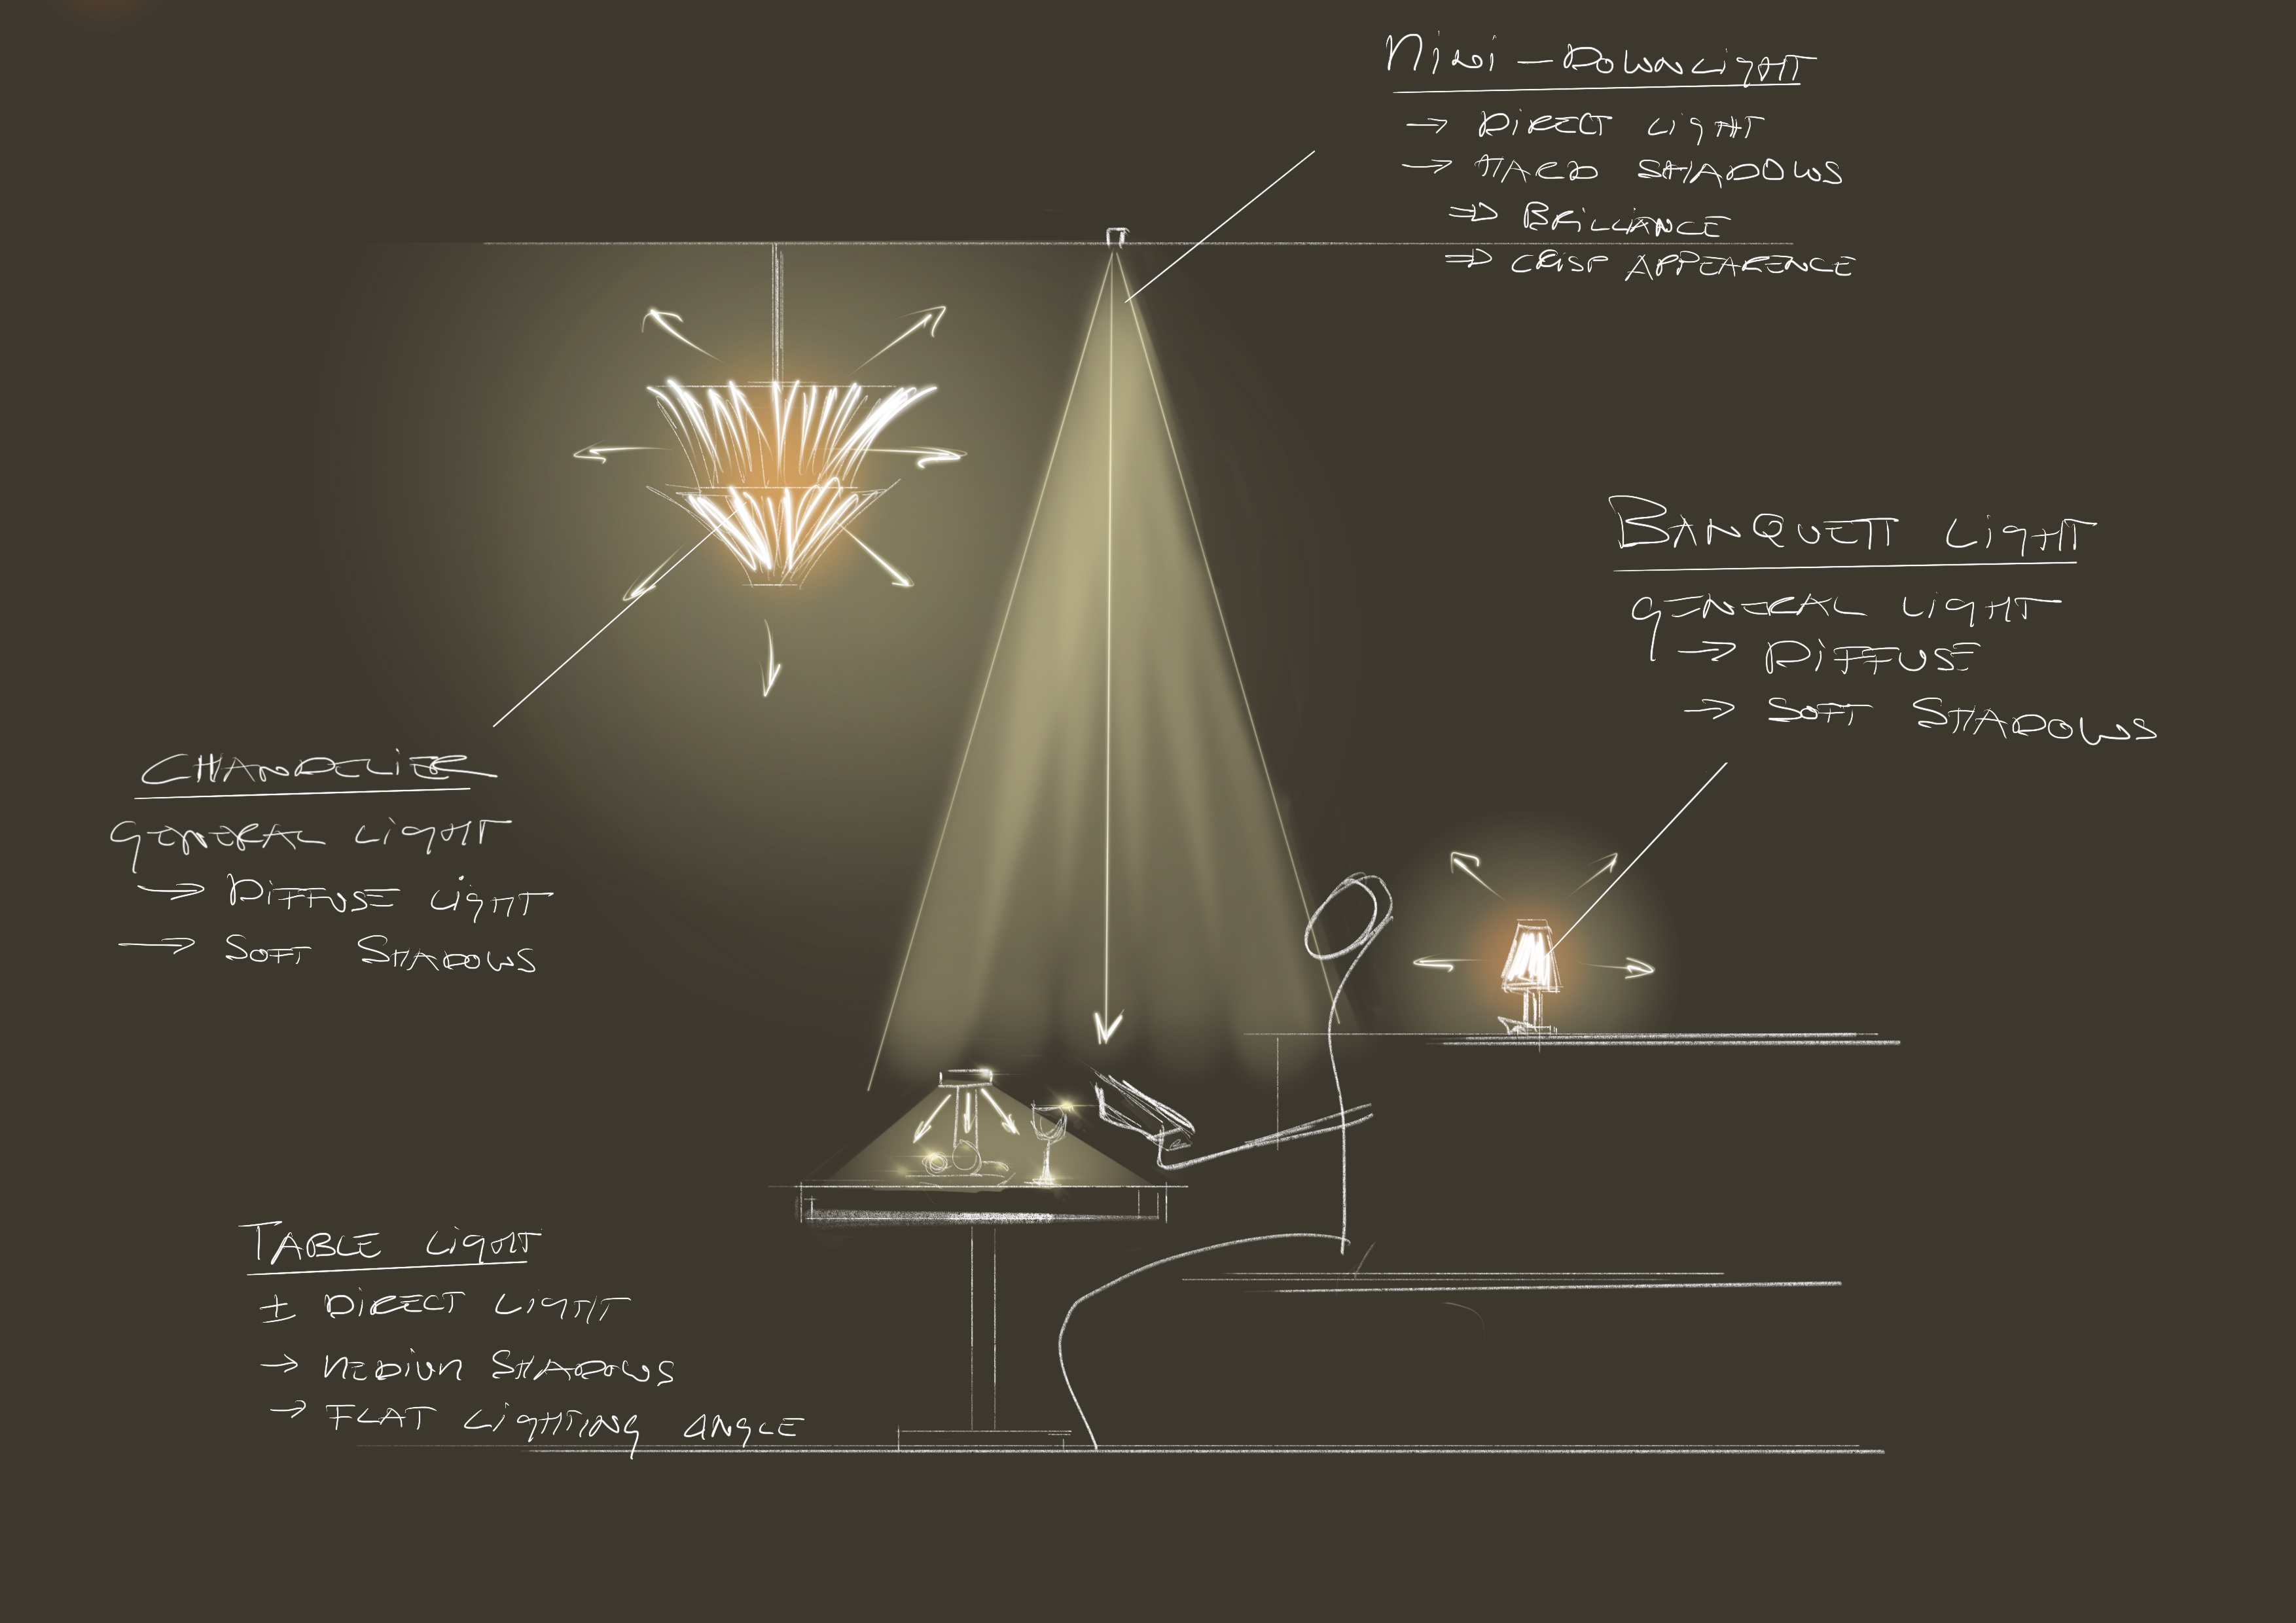 Lichtkonzept-Prinzipschnitt